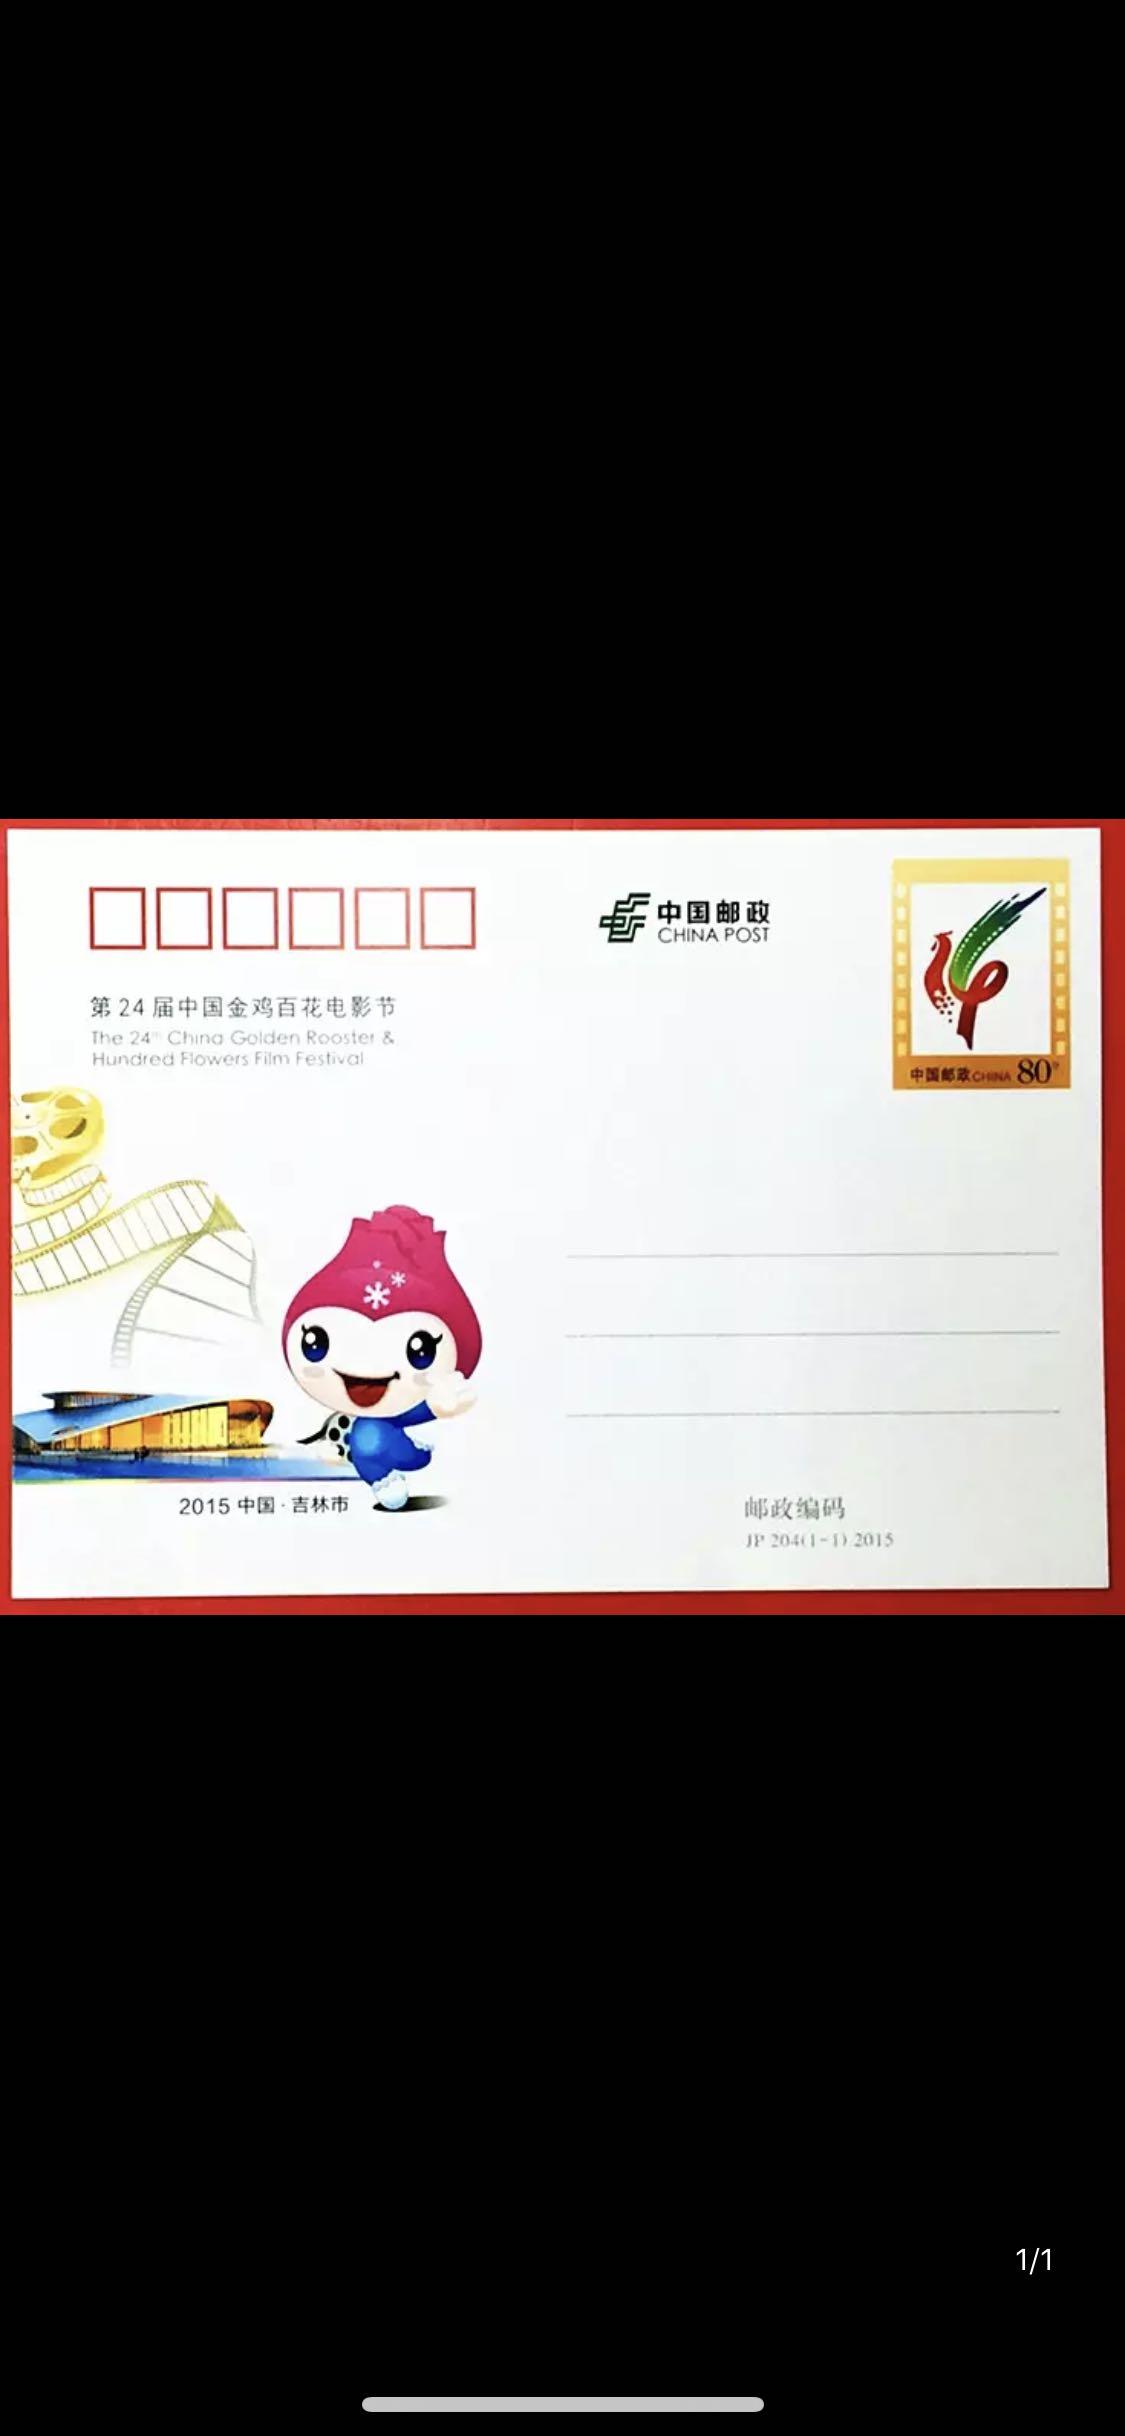 JP204 2015年  第24届中国金鸡百花电影节 纪念邮资明信片邮资片 Изображение 1